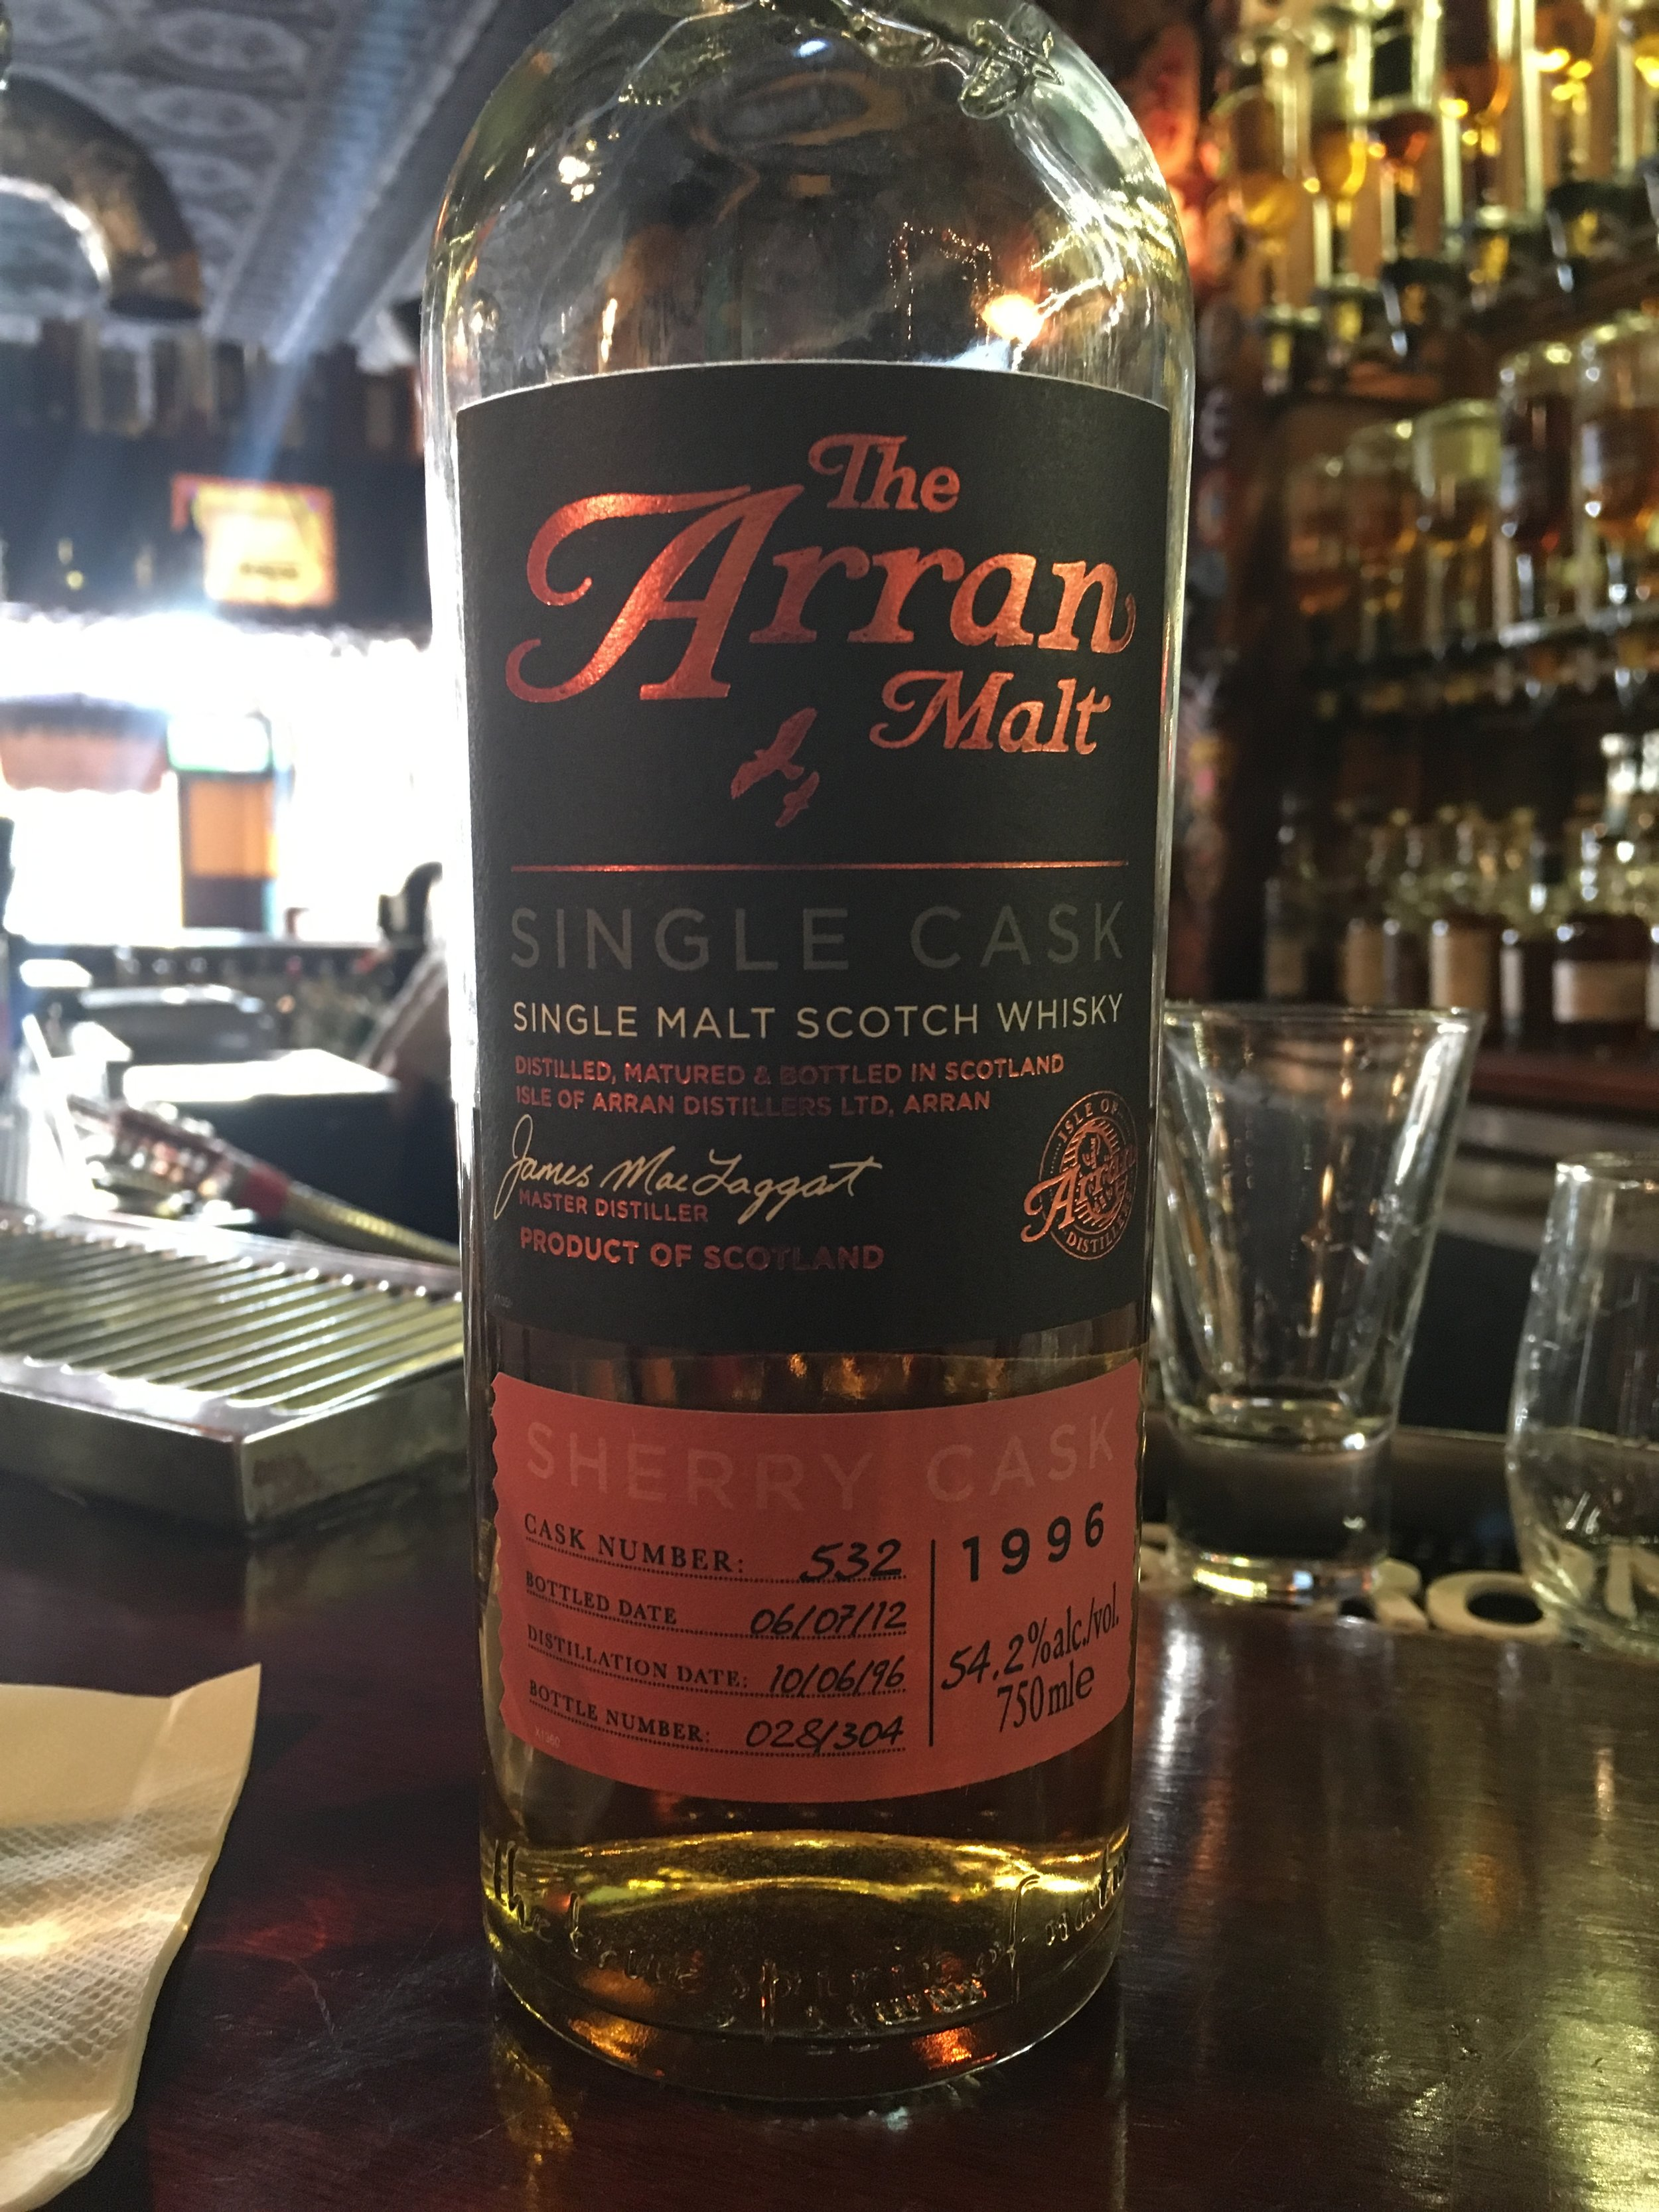 16 Year Old | 54.2% ABV - Distillery | Isle of Arran Distillers